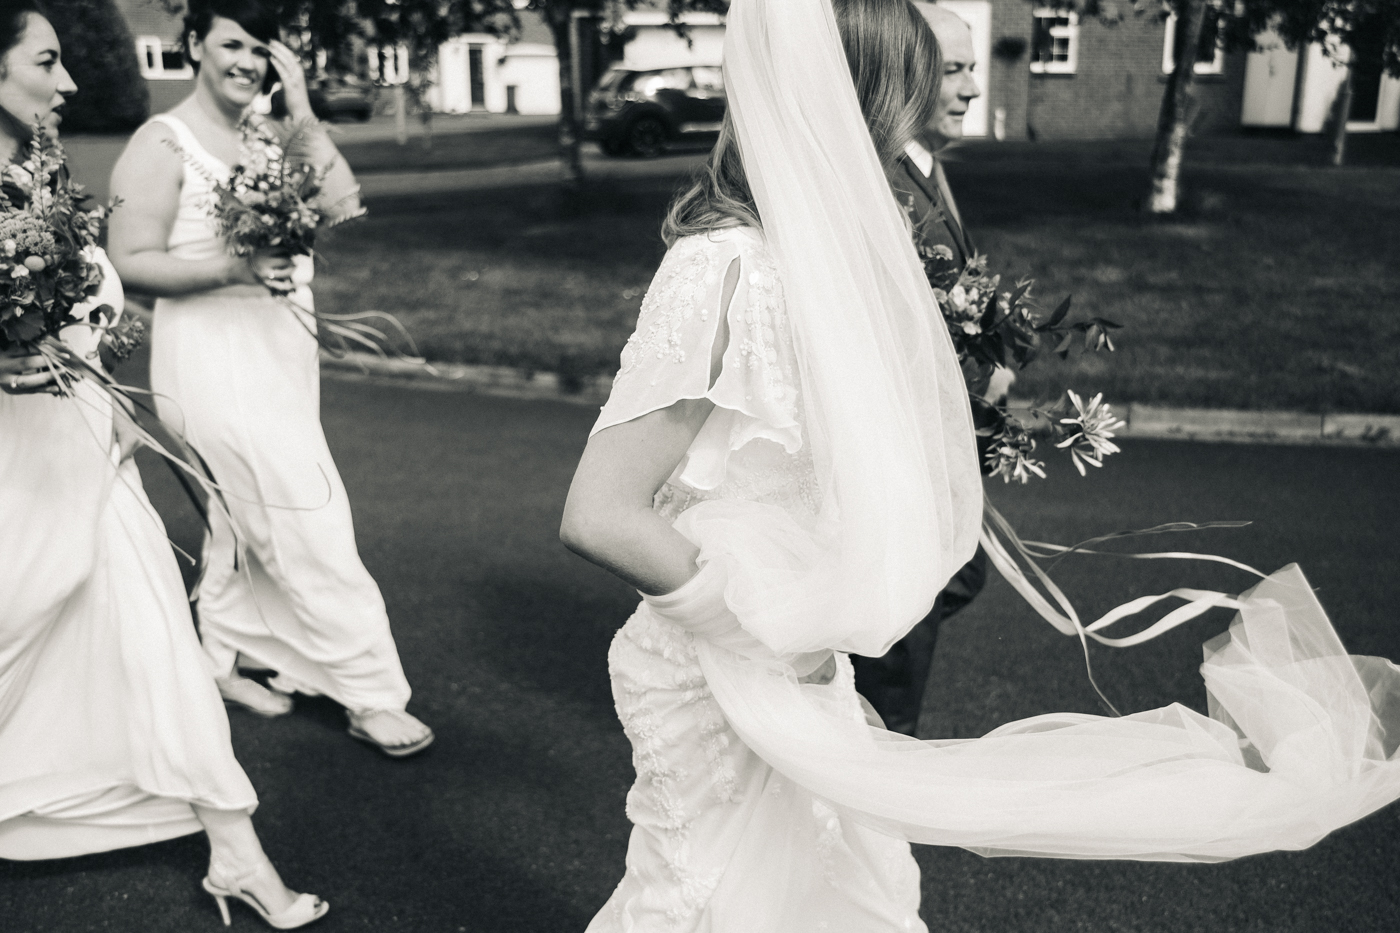 teesside-middlesbrough-north-east-wedding-photographer-creative-wedding-venues-0003.jpg